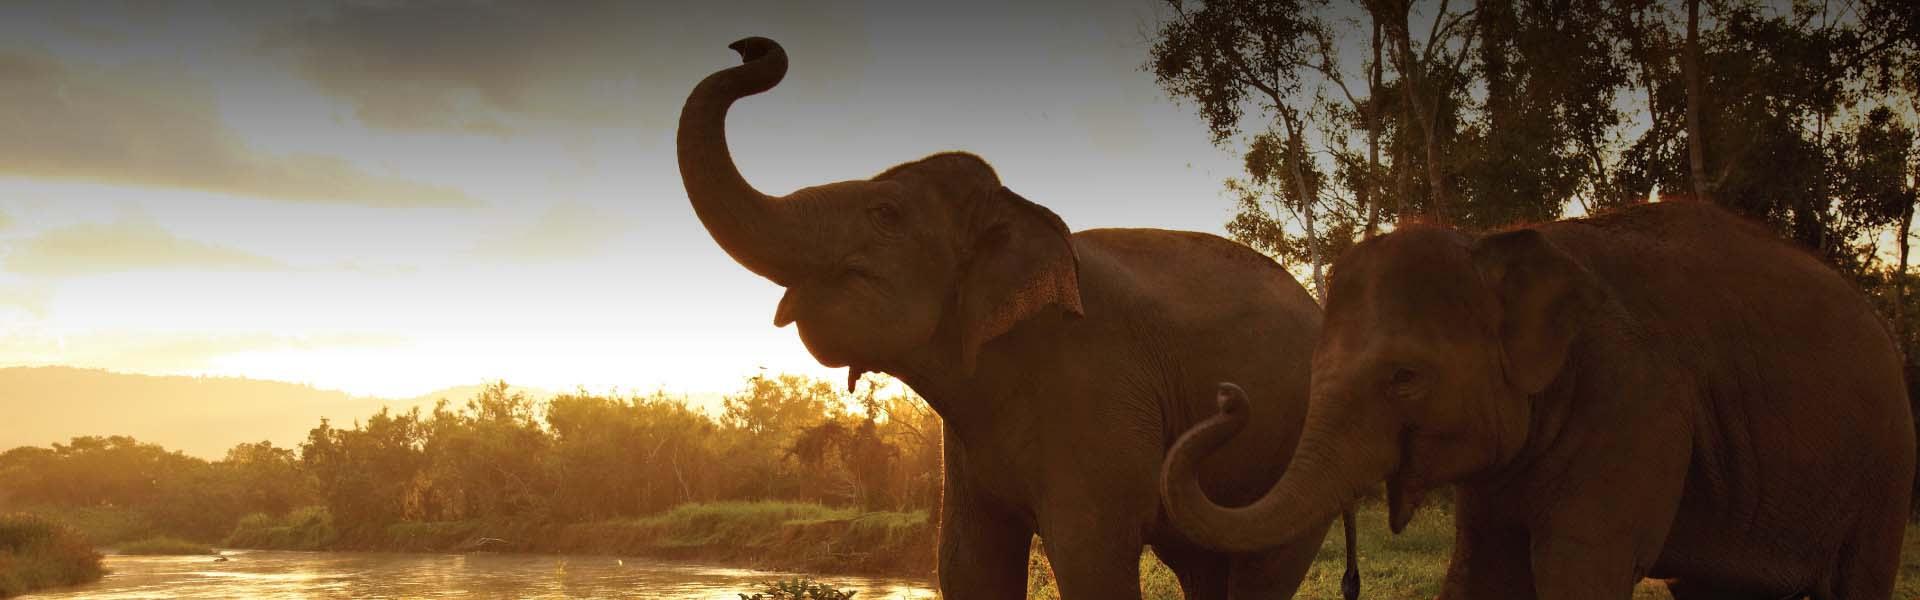 Chiang Rai Yoga | Elephant & Yoga and Spa by Anantara Golden